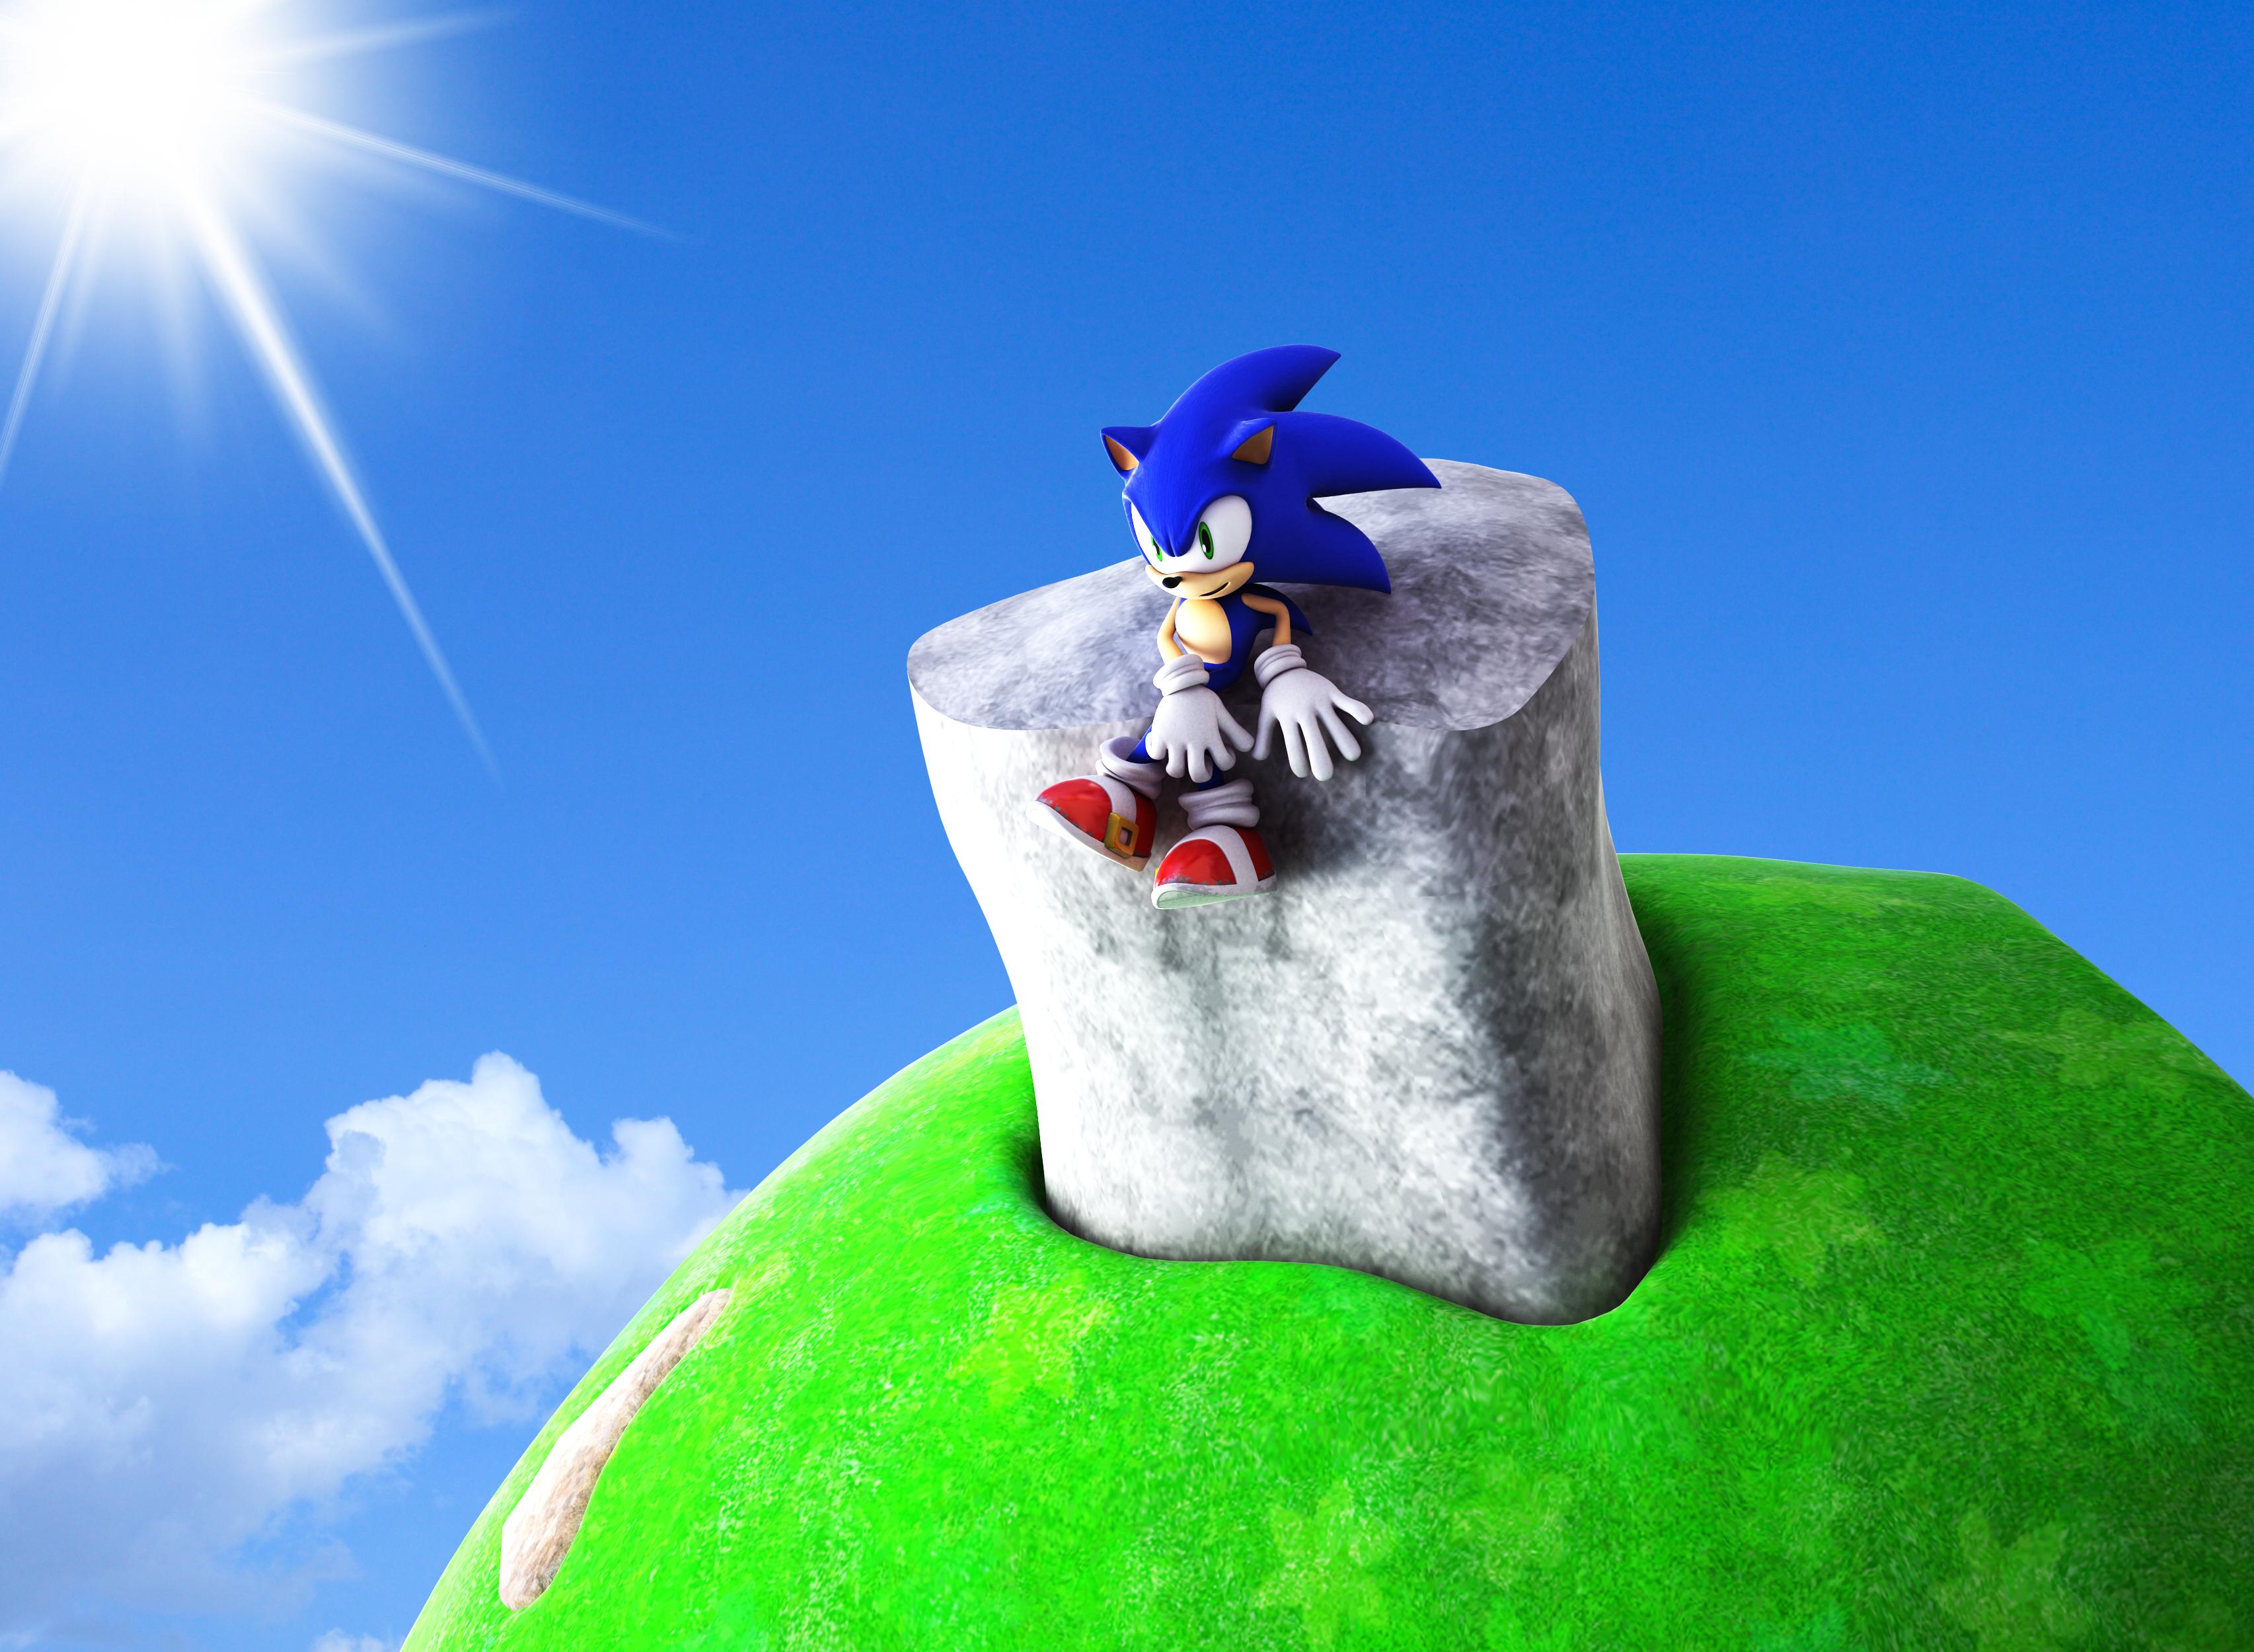 Is this Mario Galaxy nows? by josh98s-Studio - 267 x 402 jpeg 26kB